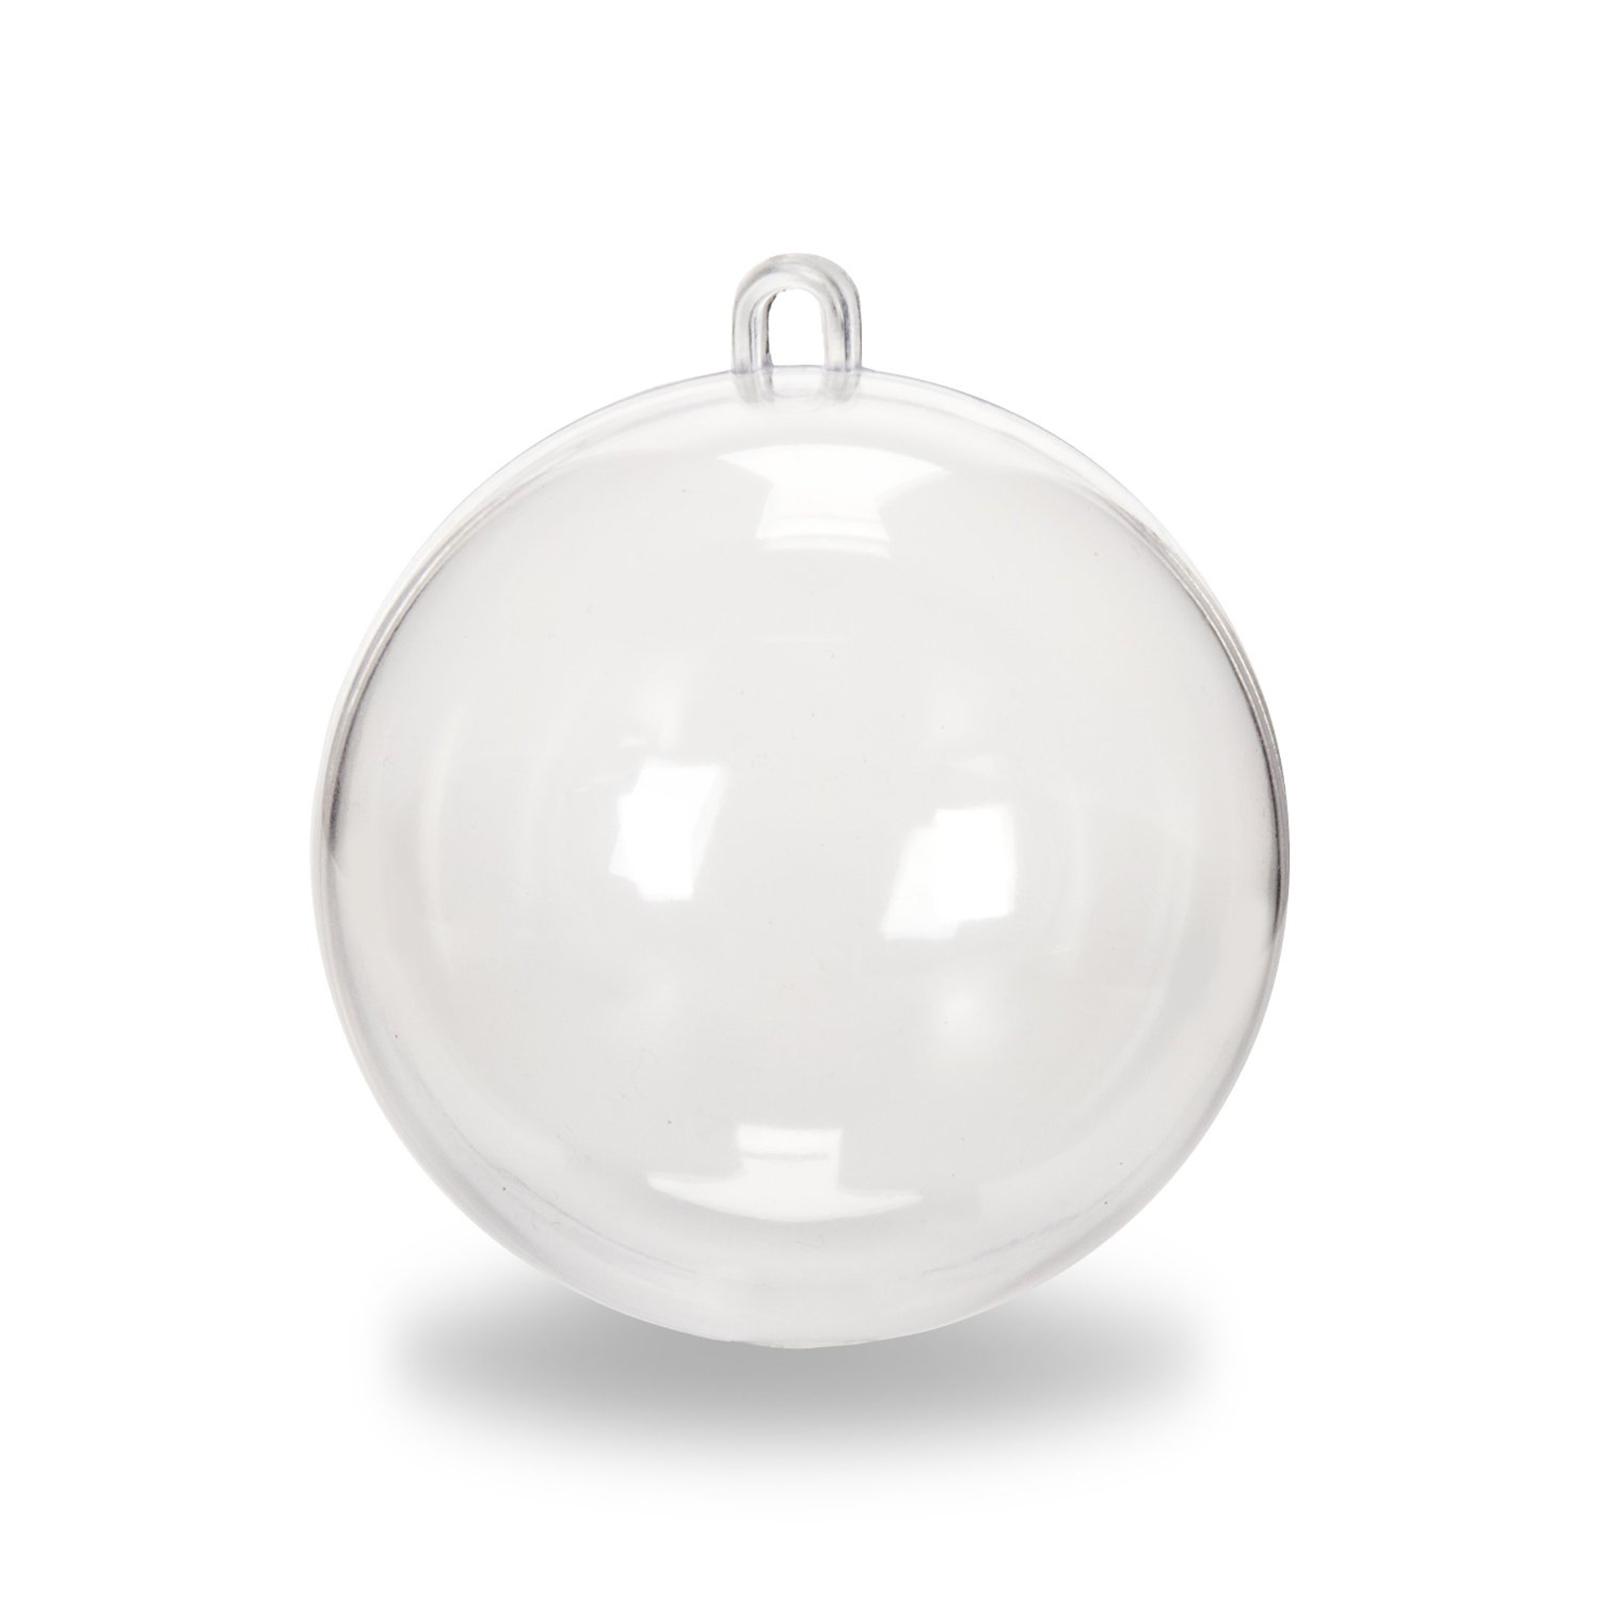 Christmas Ornament Storage Boxes Sale